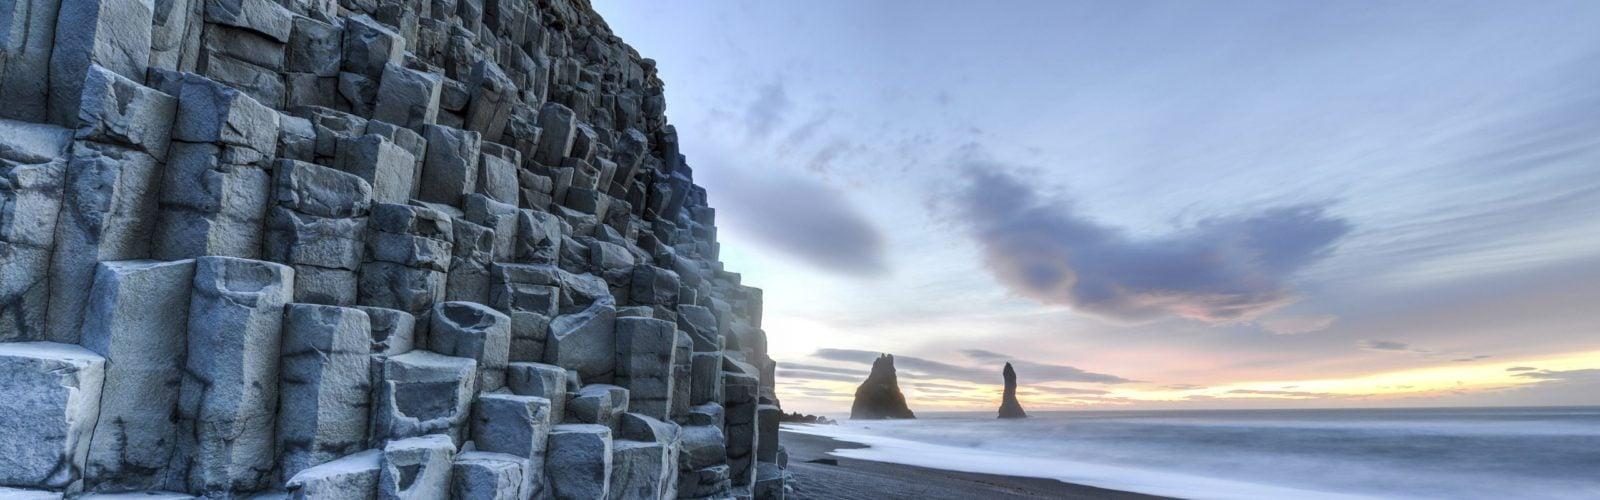 stone-wall-beach-iceland